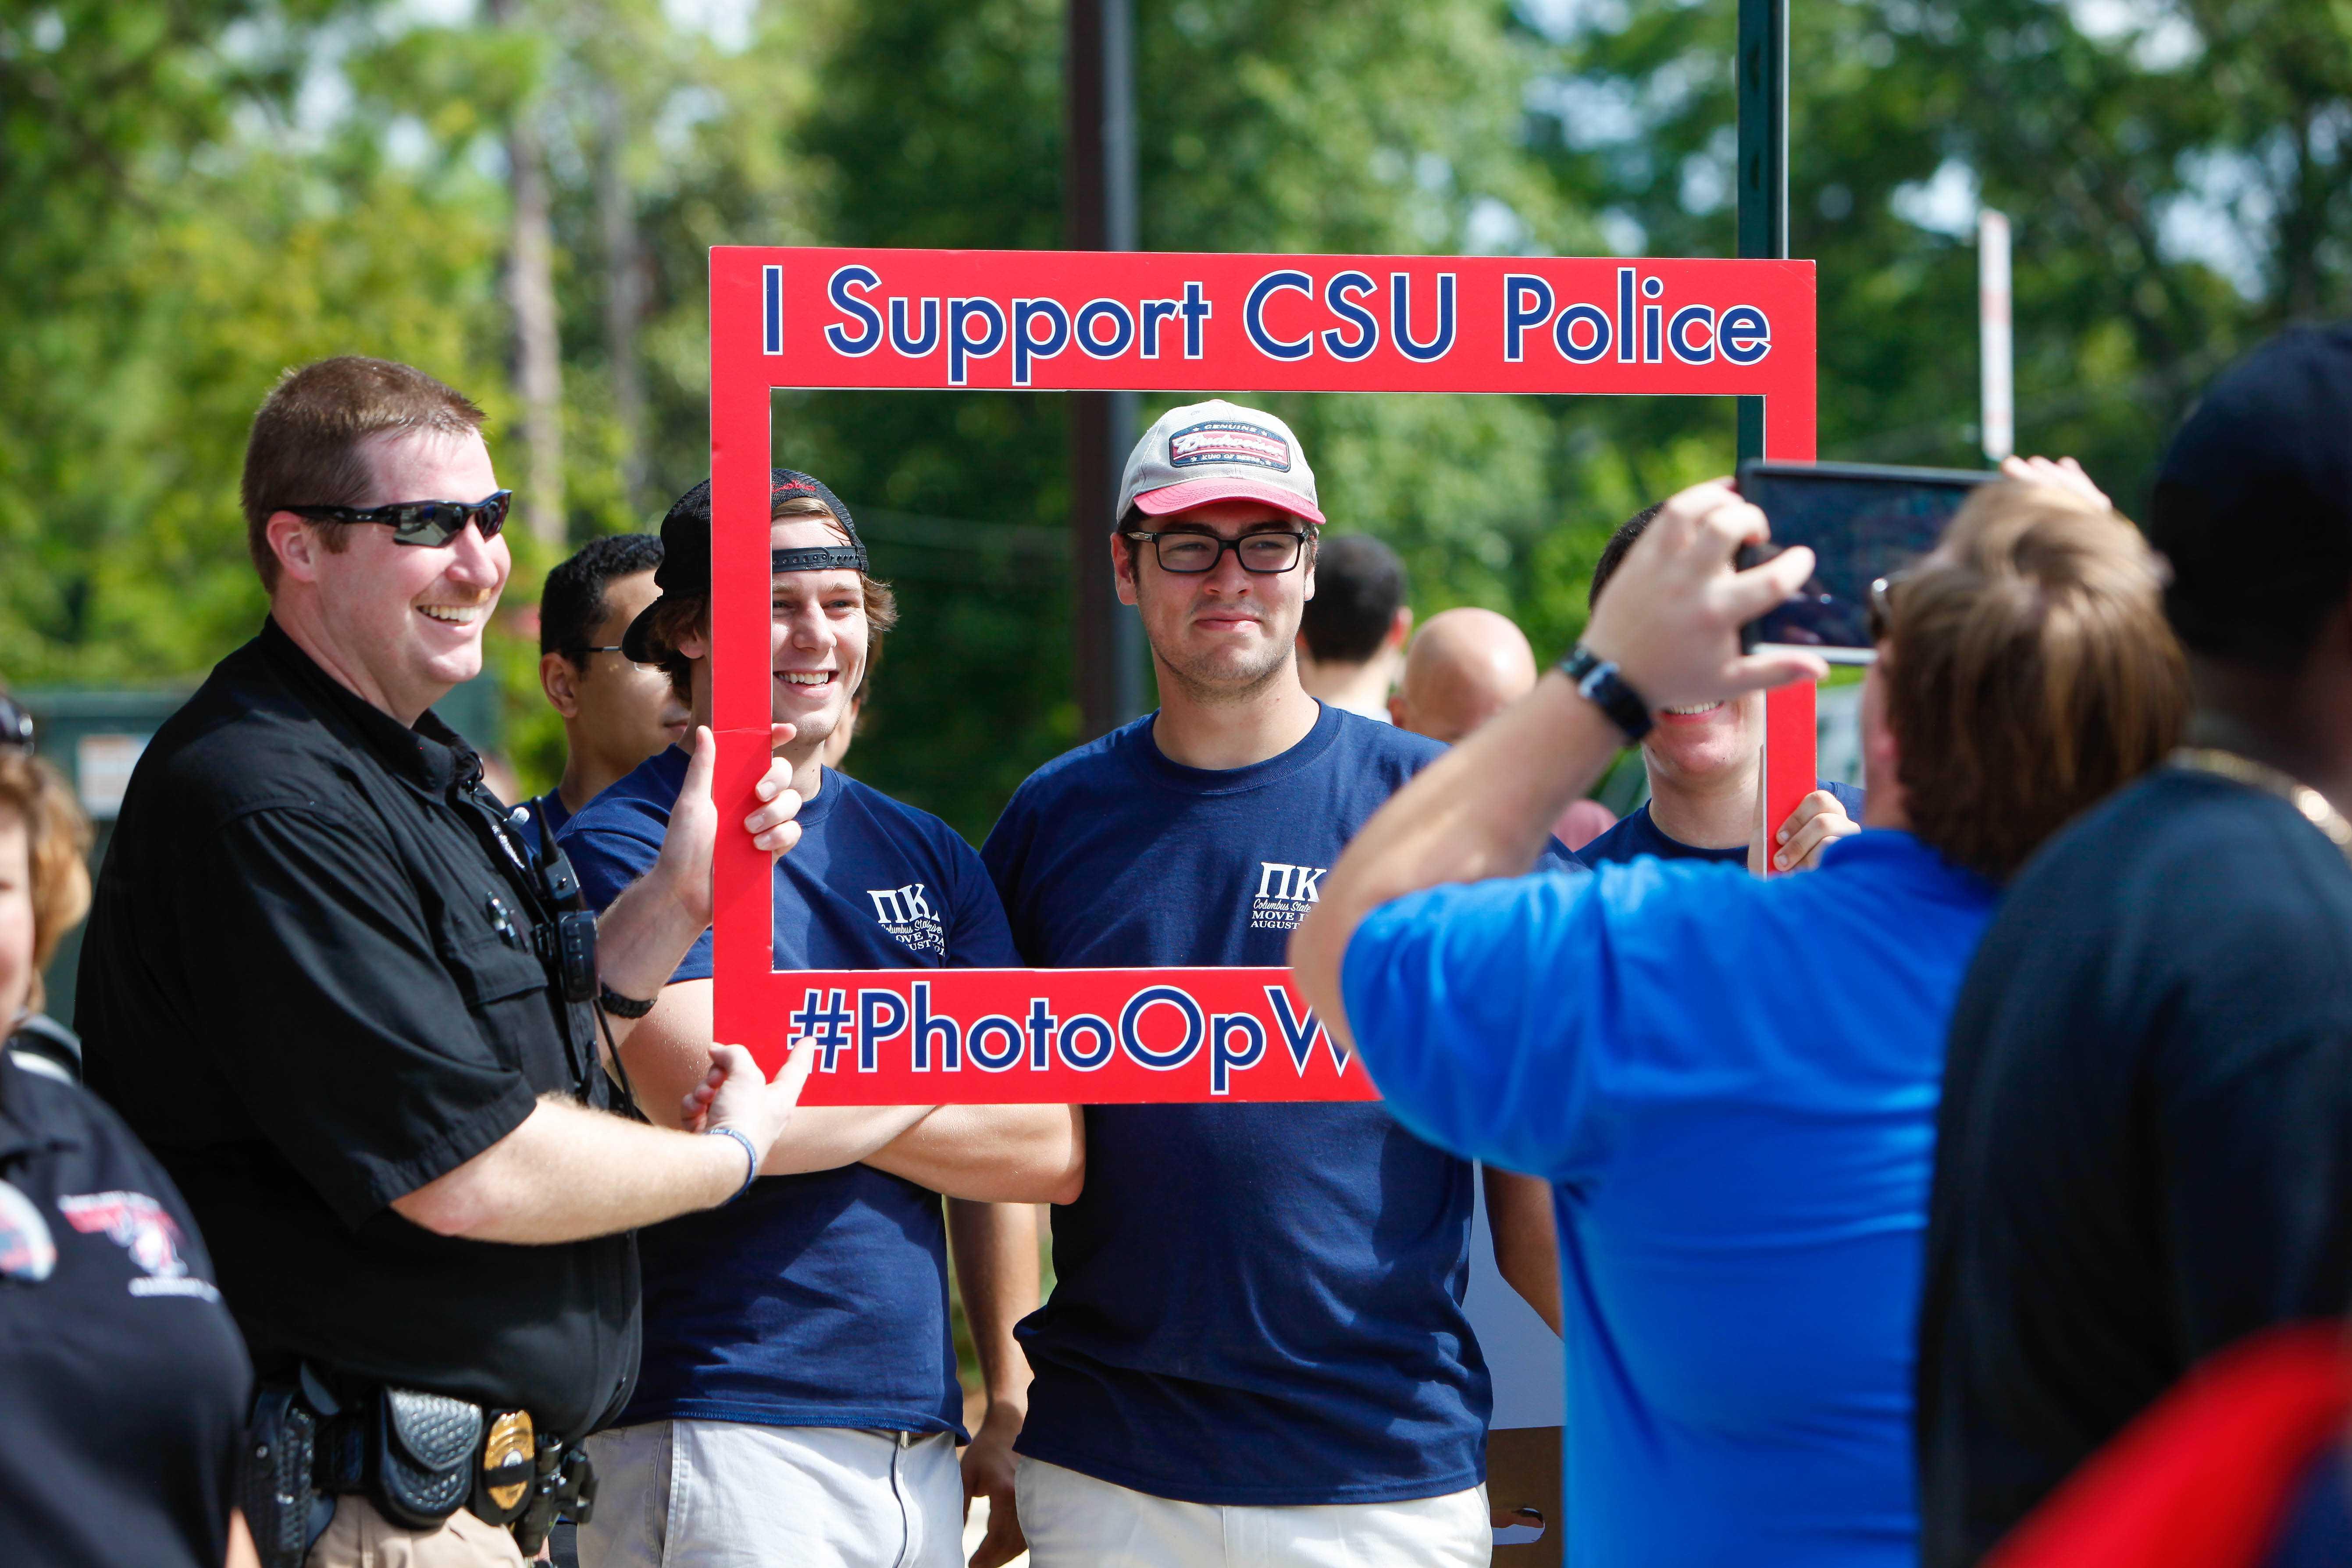 Photo by CSU